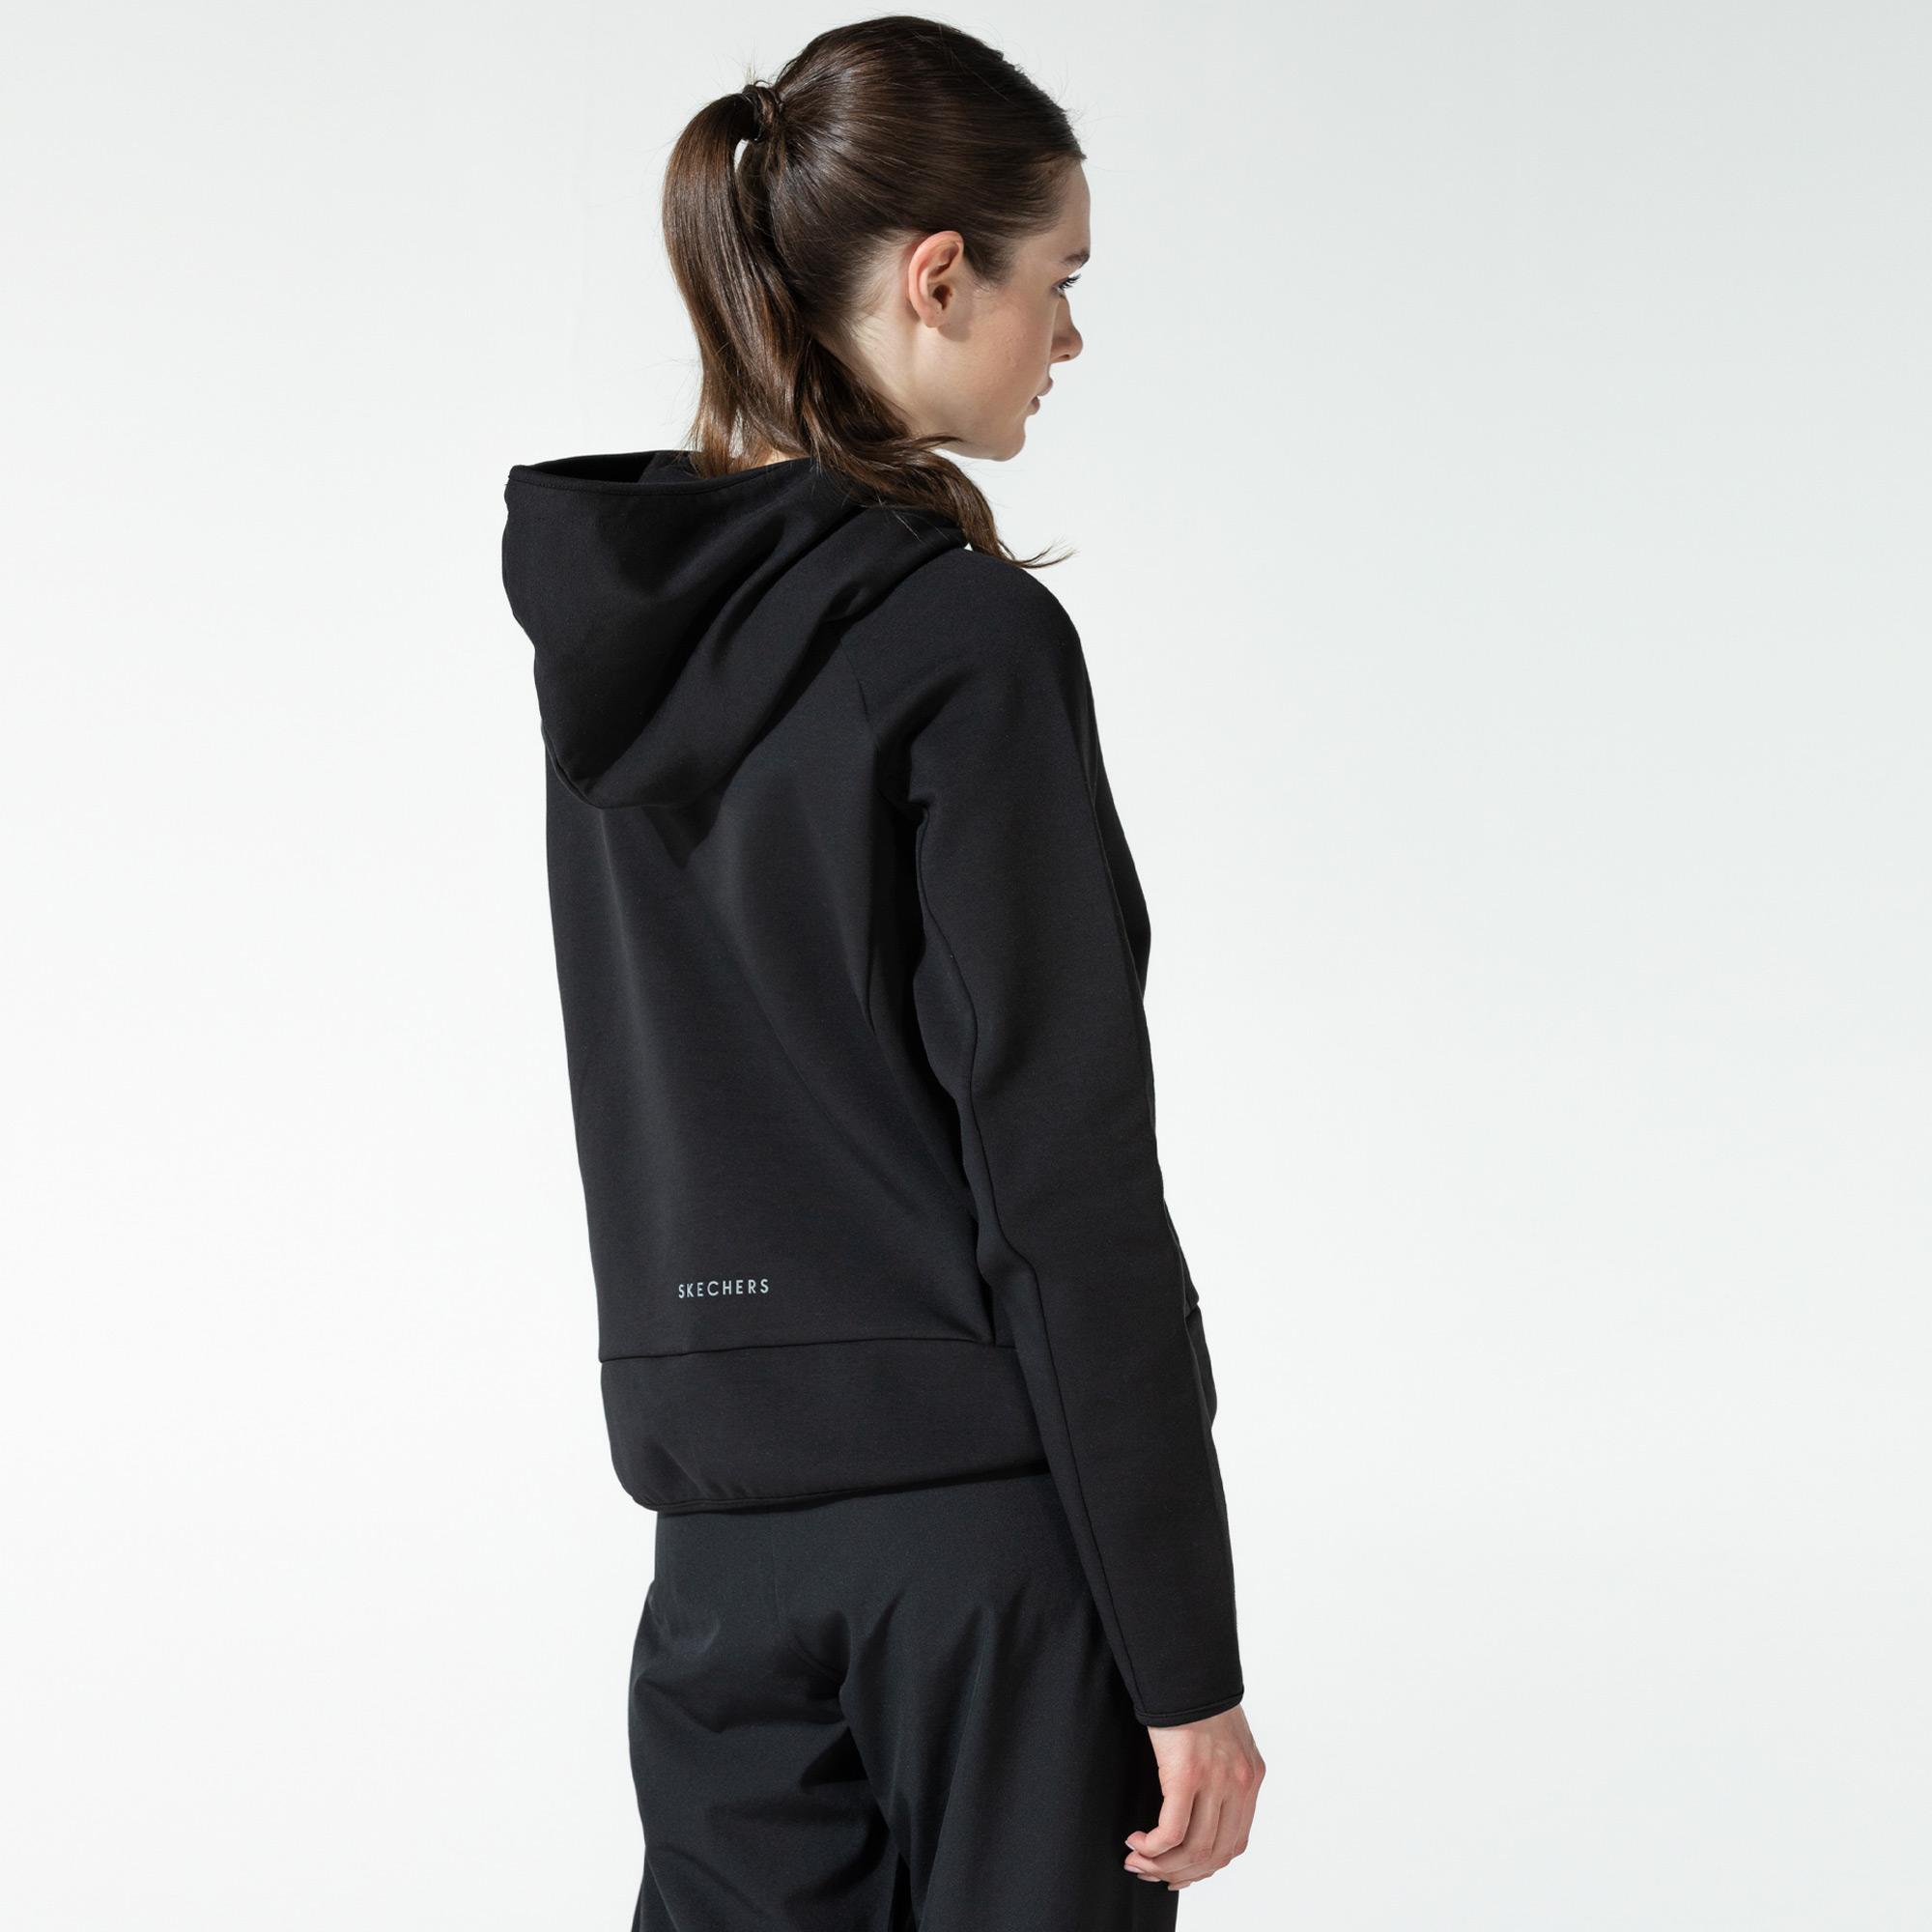 Skechers 2X-i Lock Kadın Siyah Sweatshirt